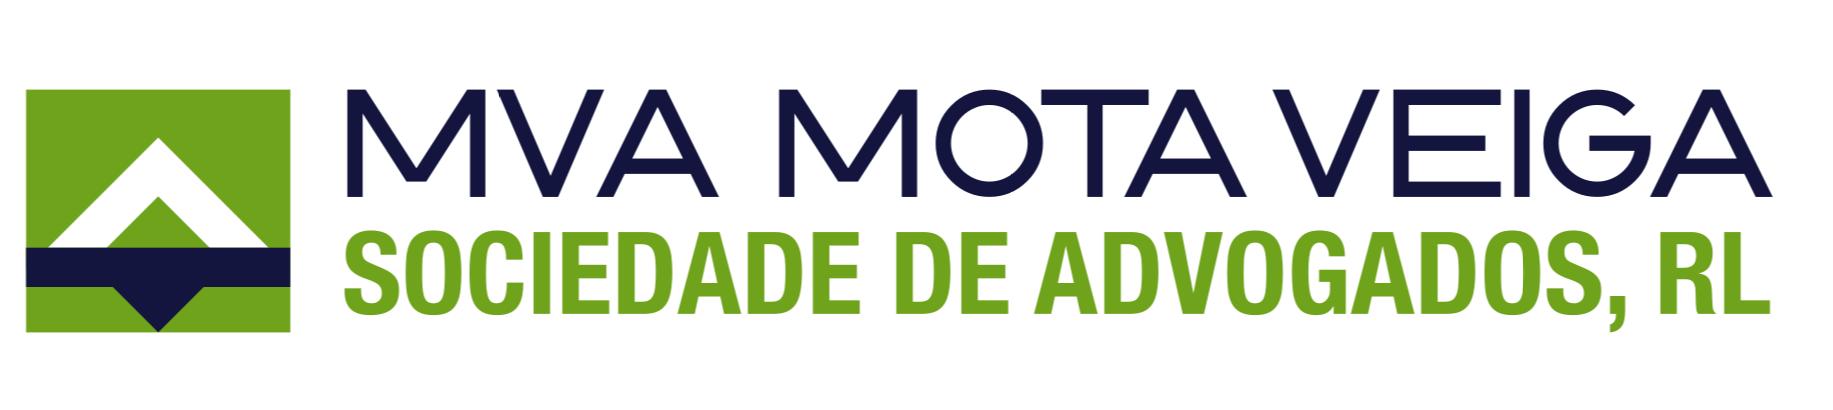 MVA Mota Veiga logo